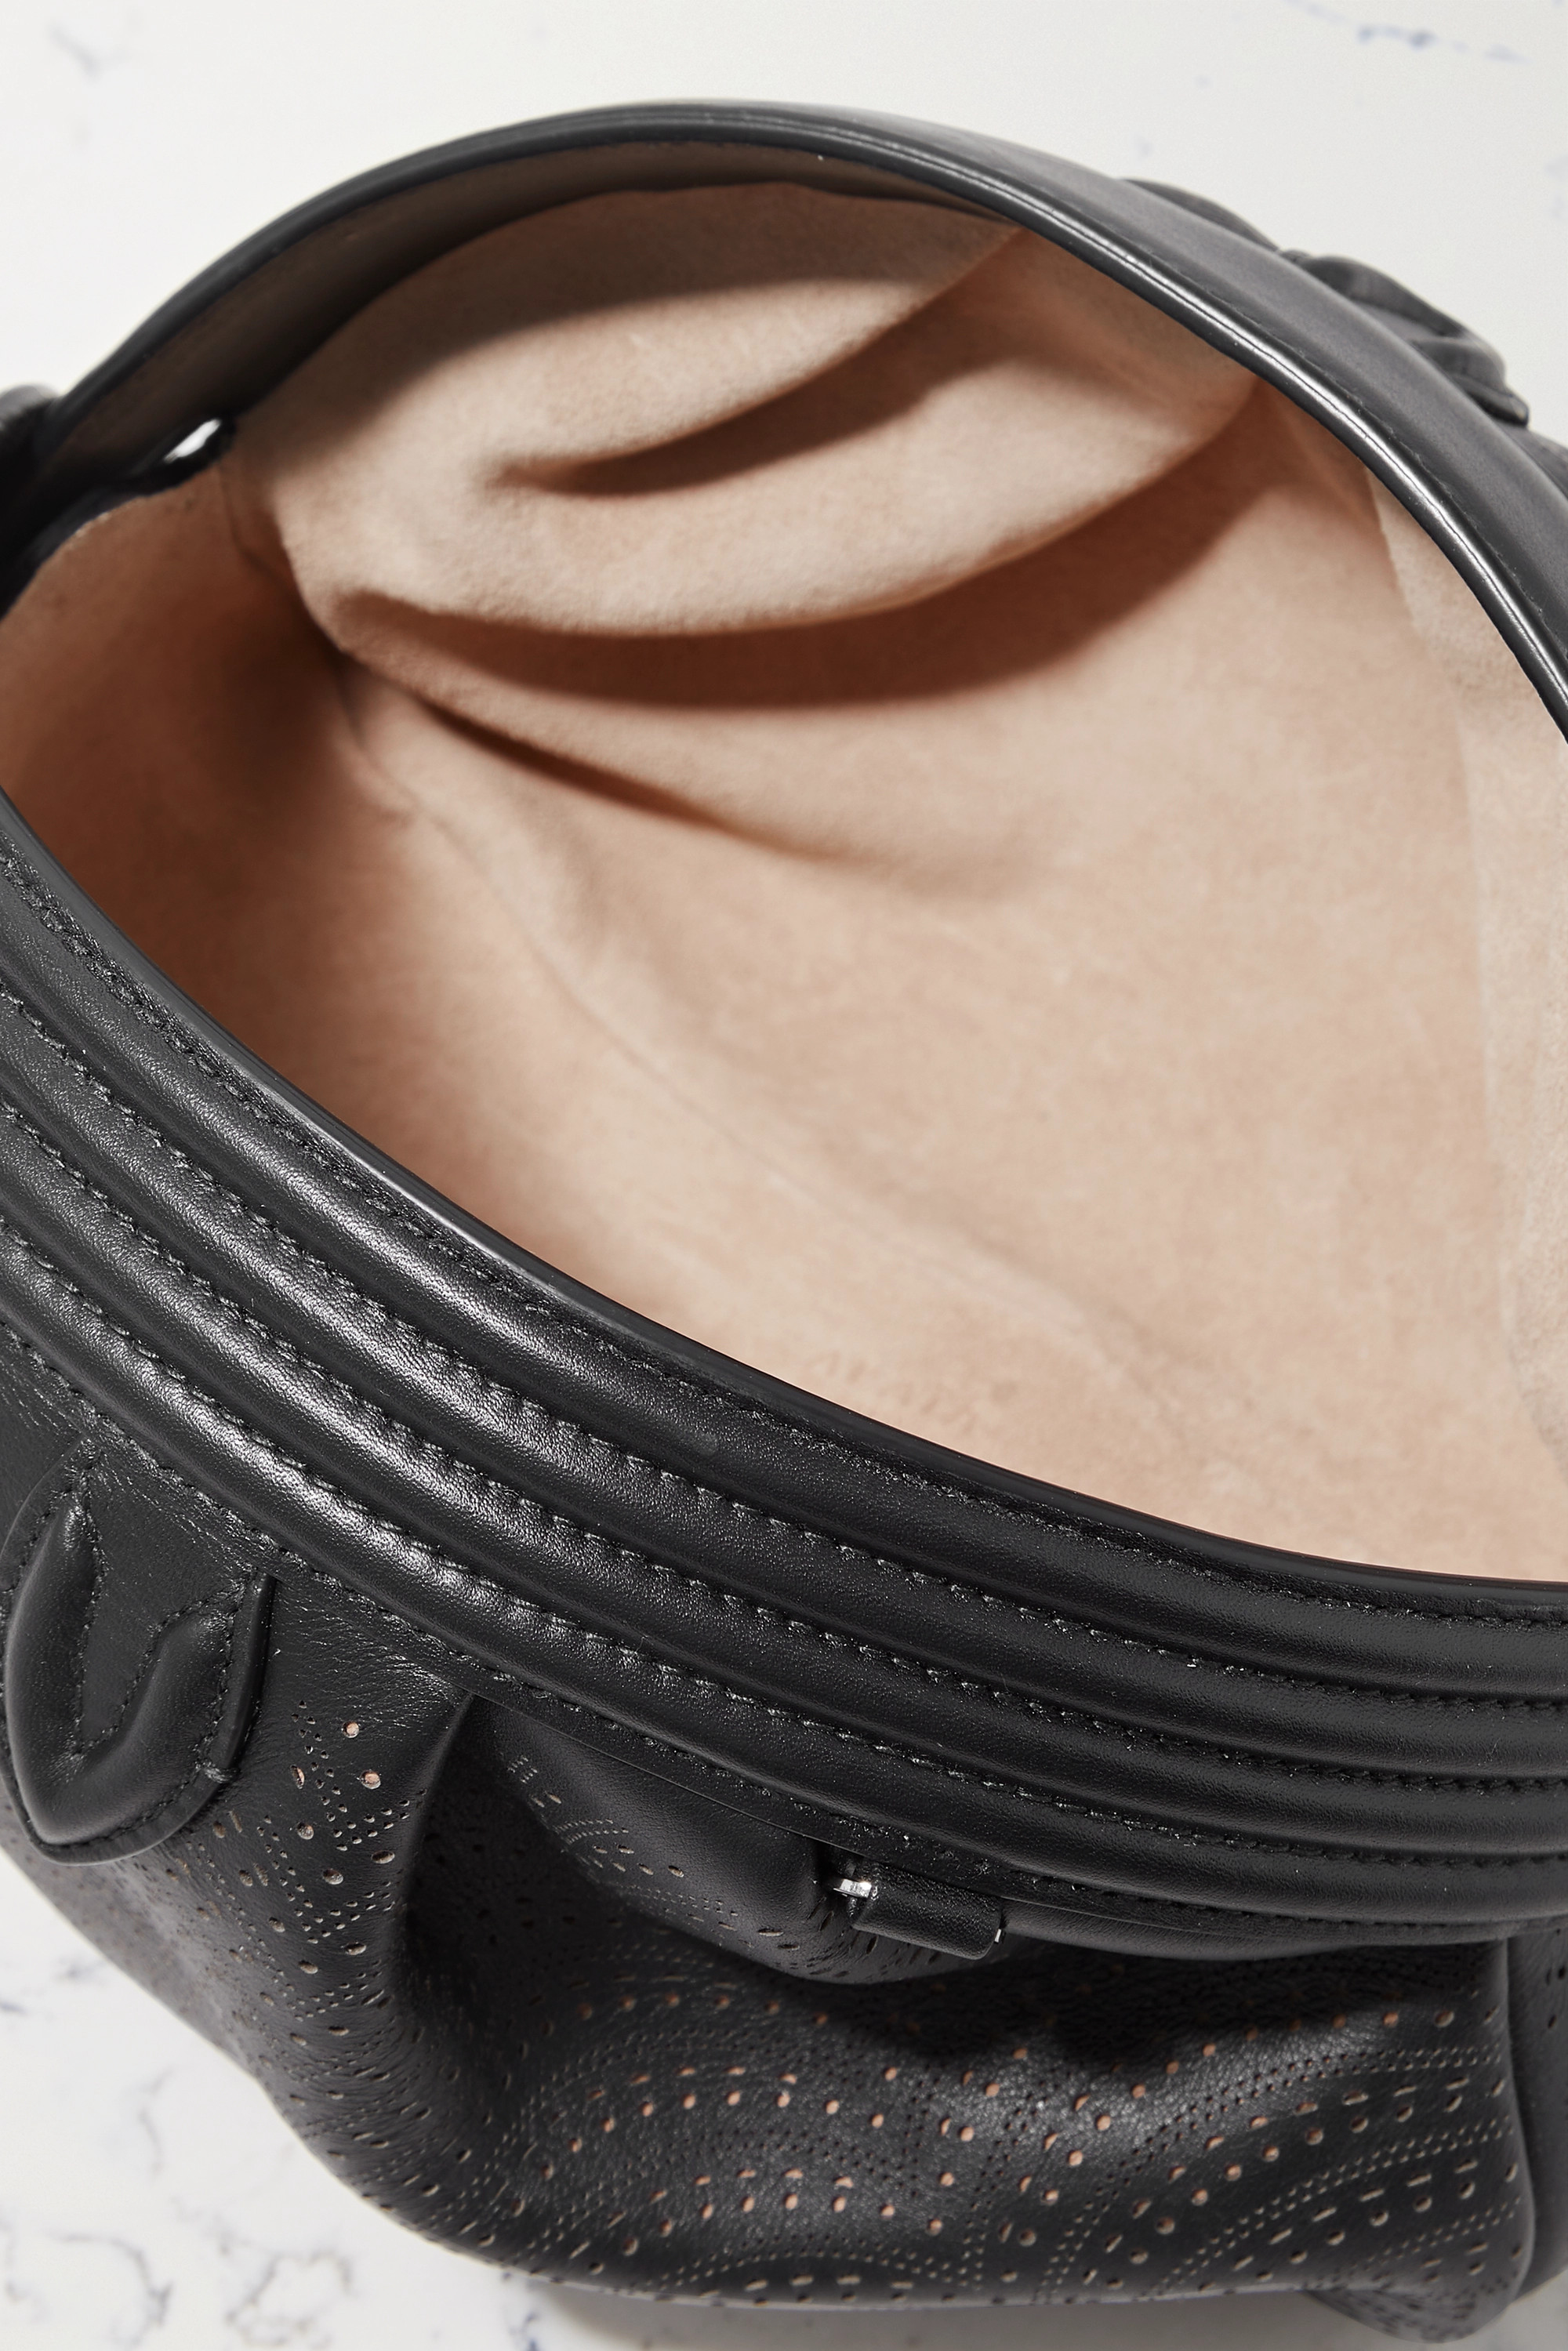 Alaïa Sami 21 small laser-cut leather clutch